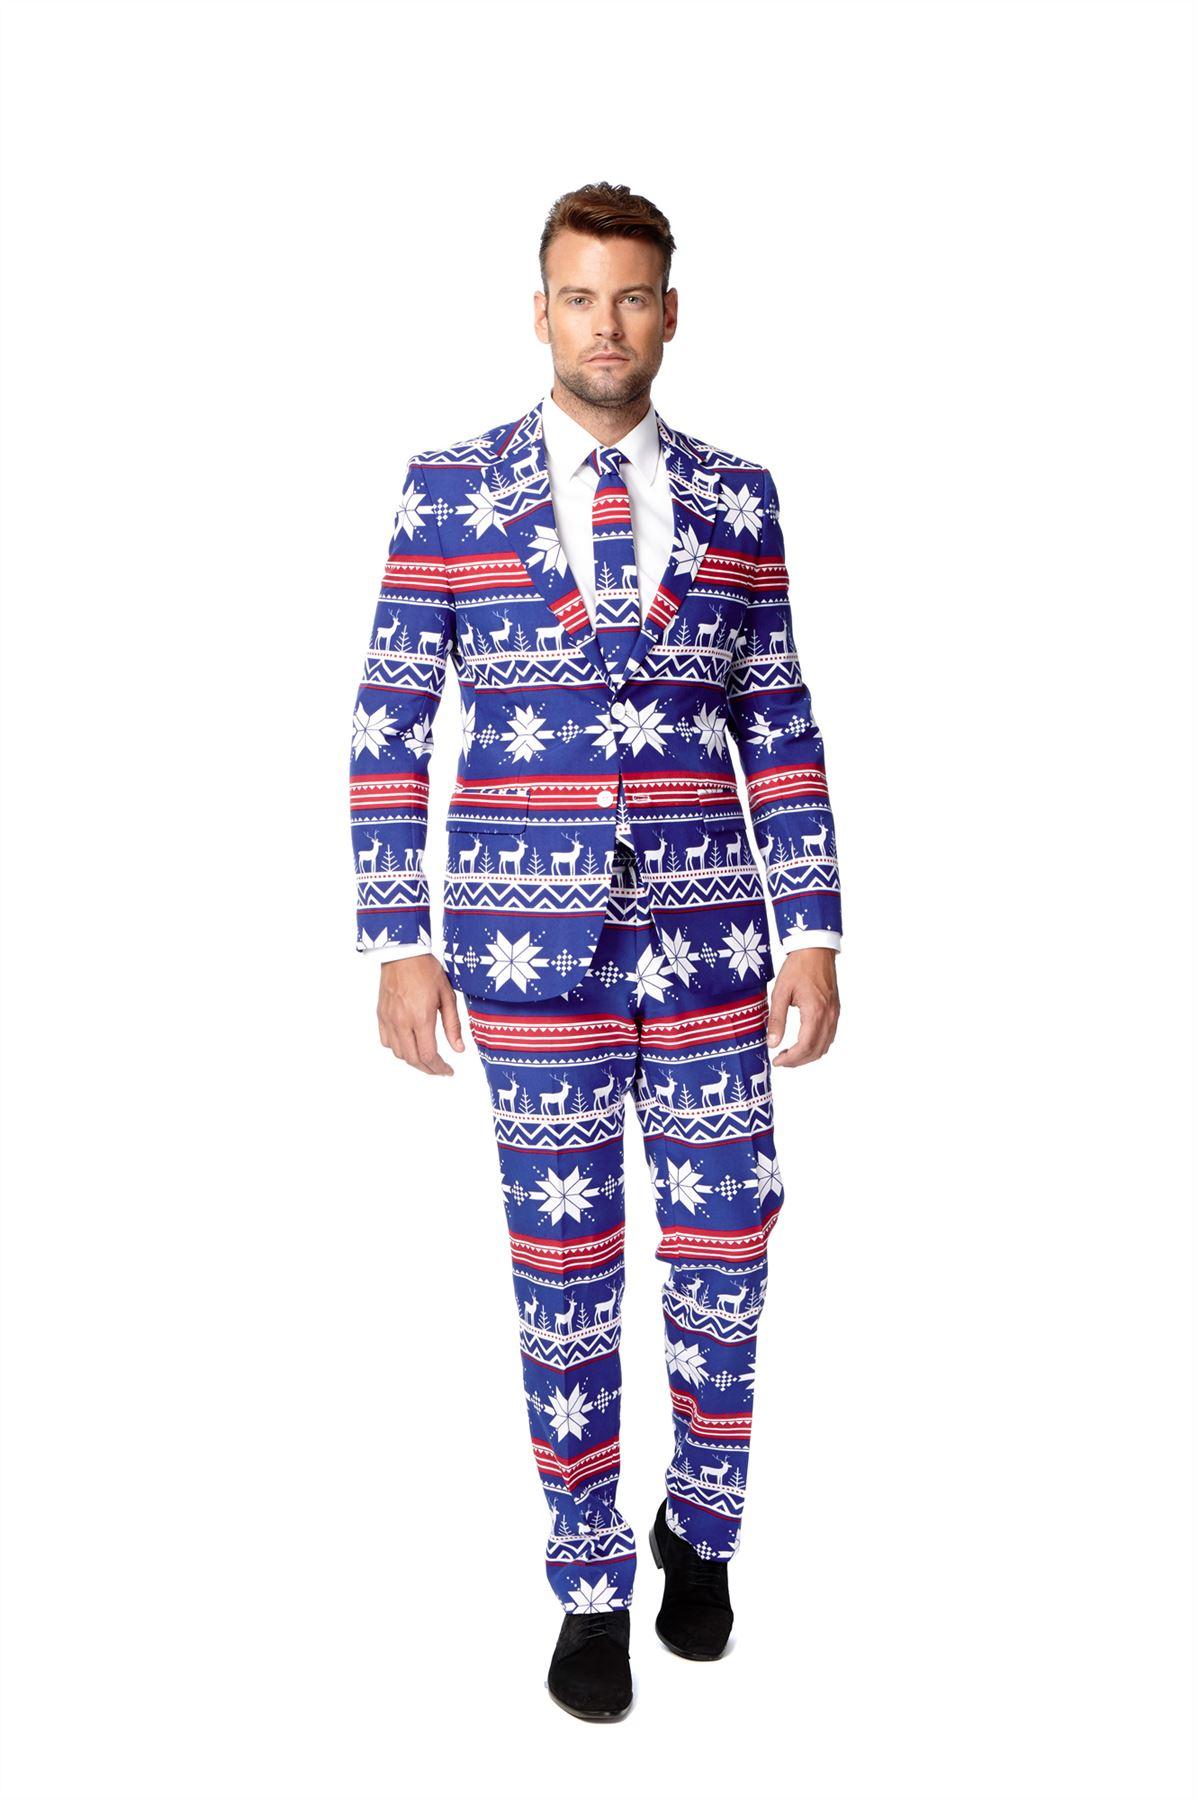 Mens Christmas Opposuit Fancy Dress Costume 3 Piece Suit Deluxe ...